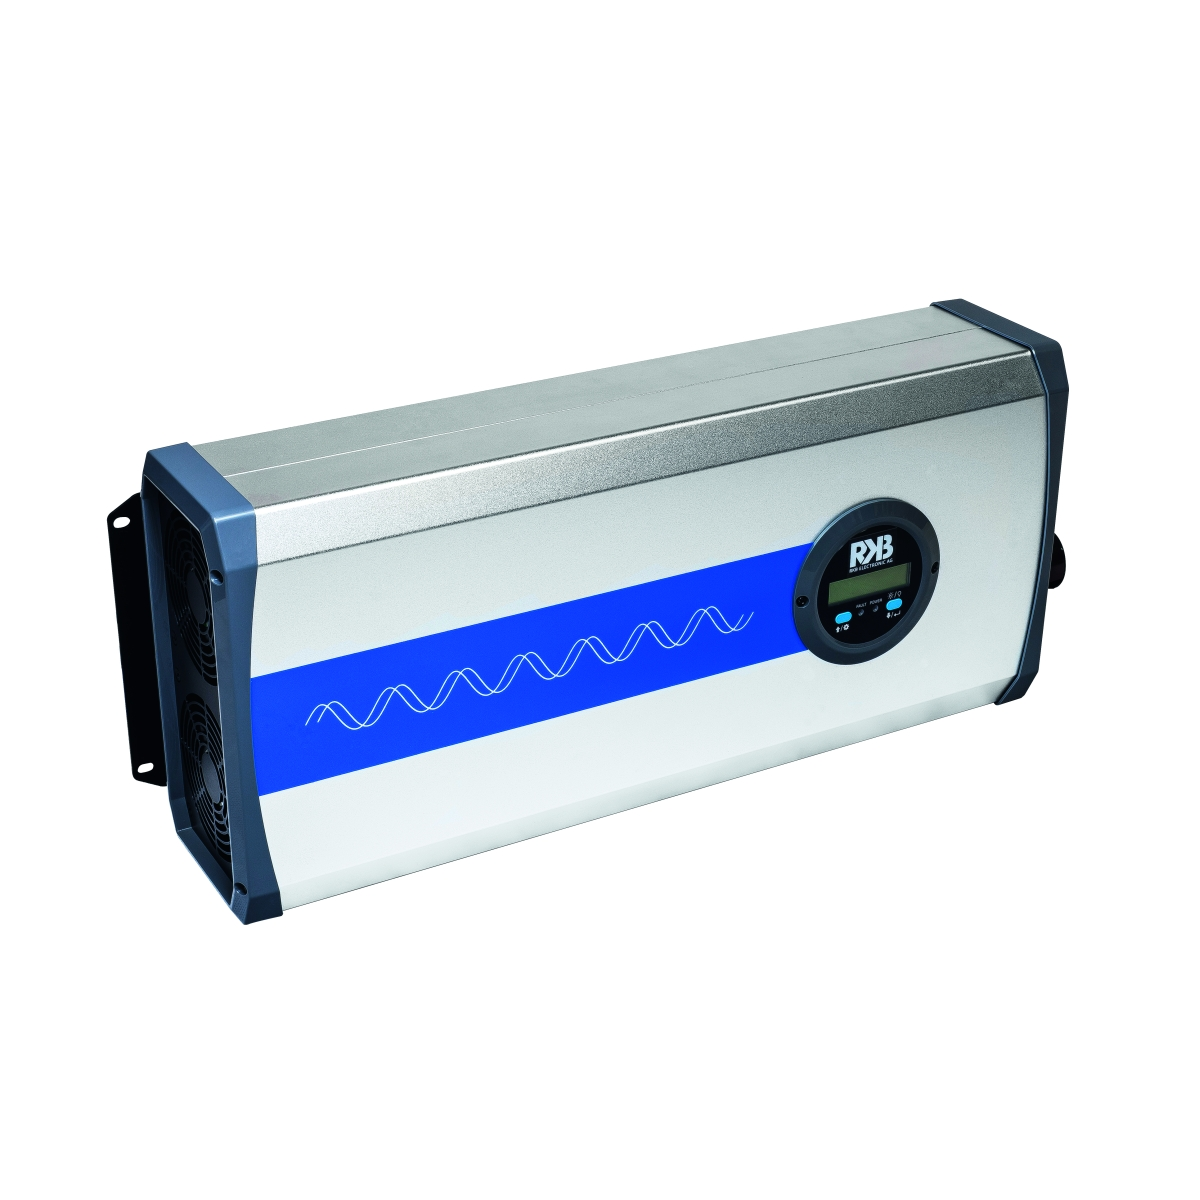 ProUser Sinus-Wechselrichter RKB 3000-12